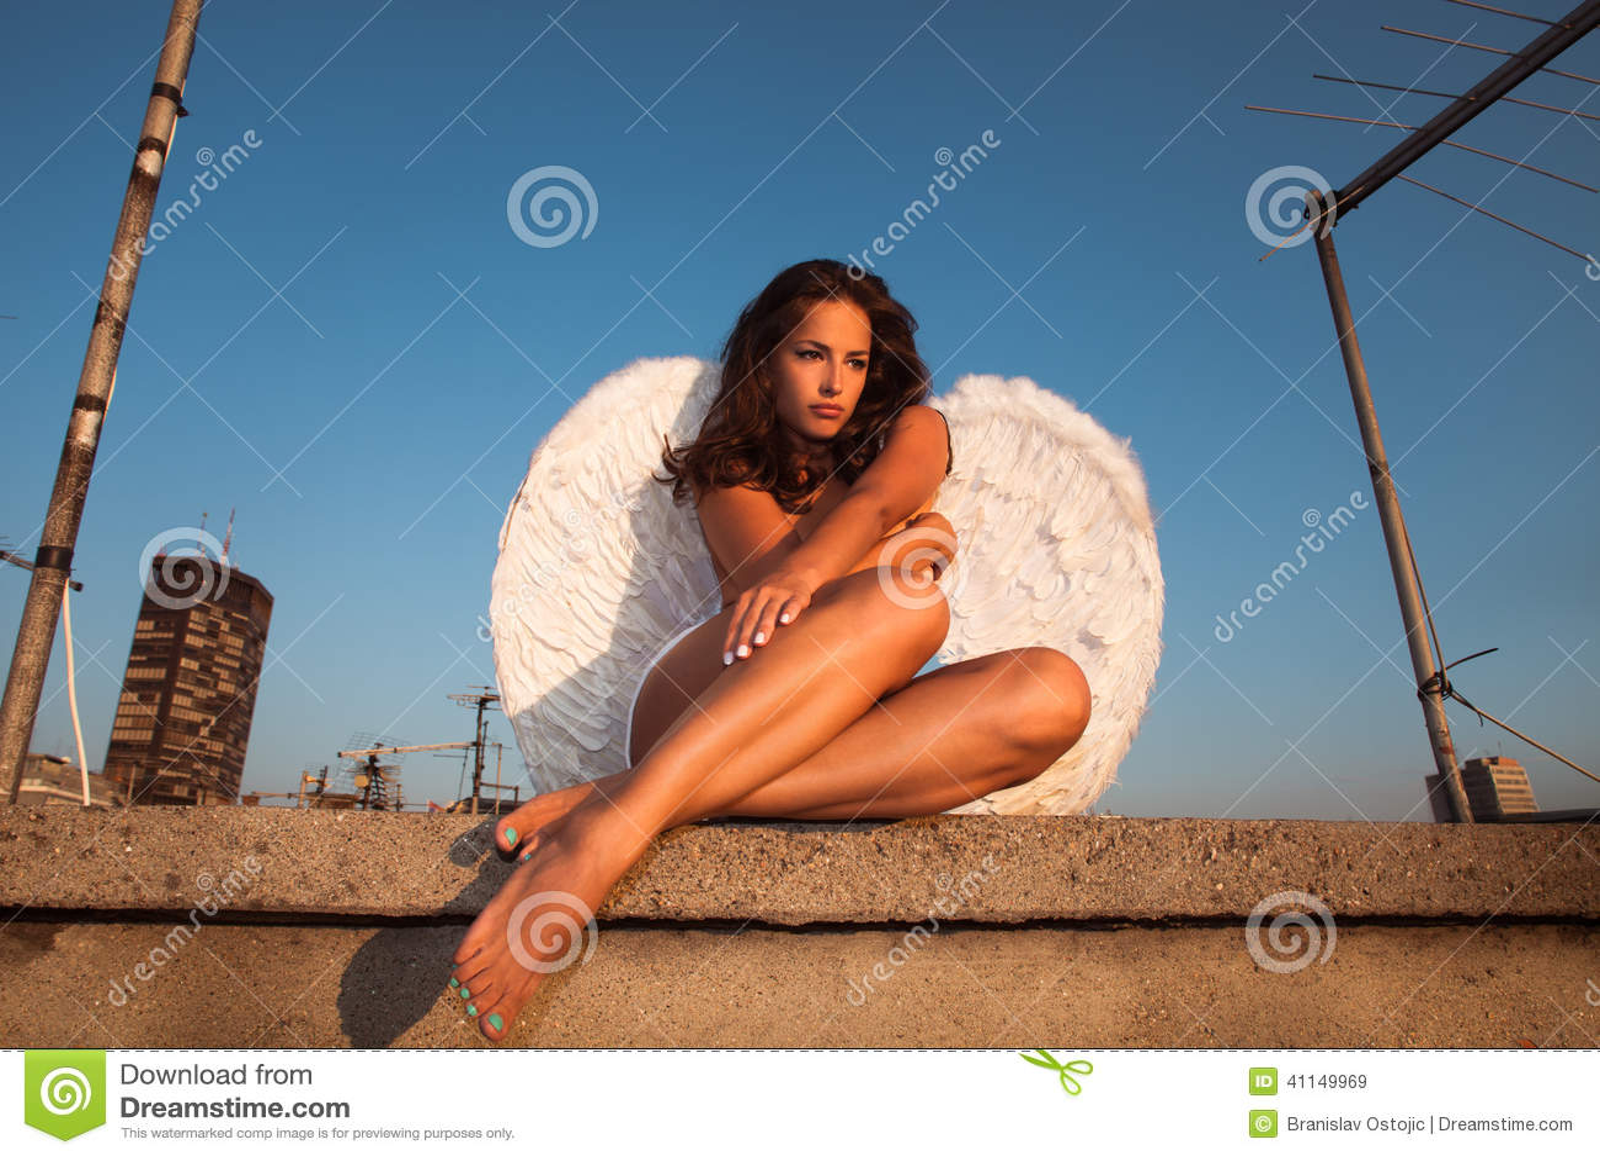 Symbolism woman roof